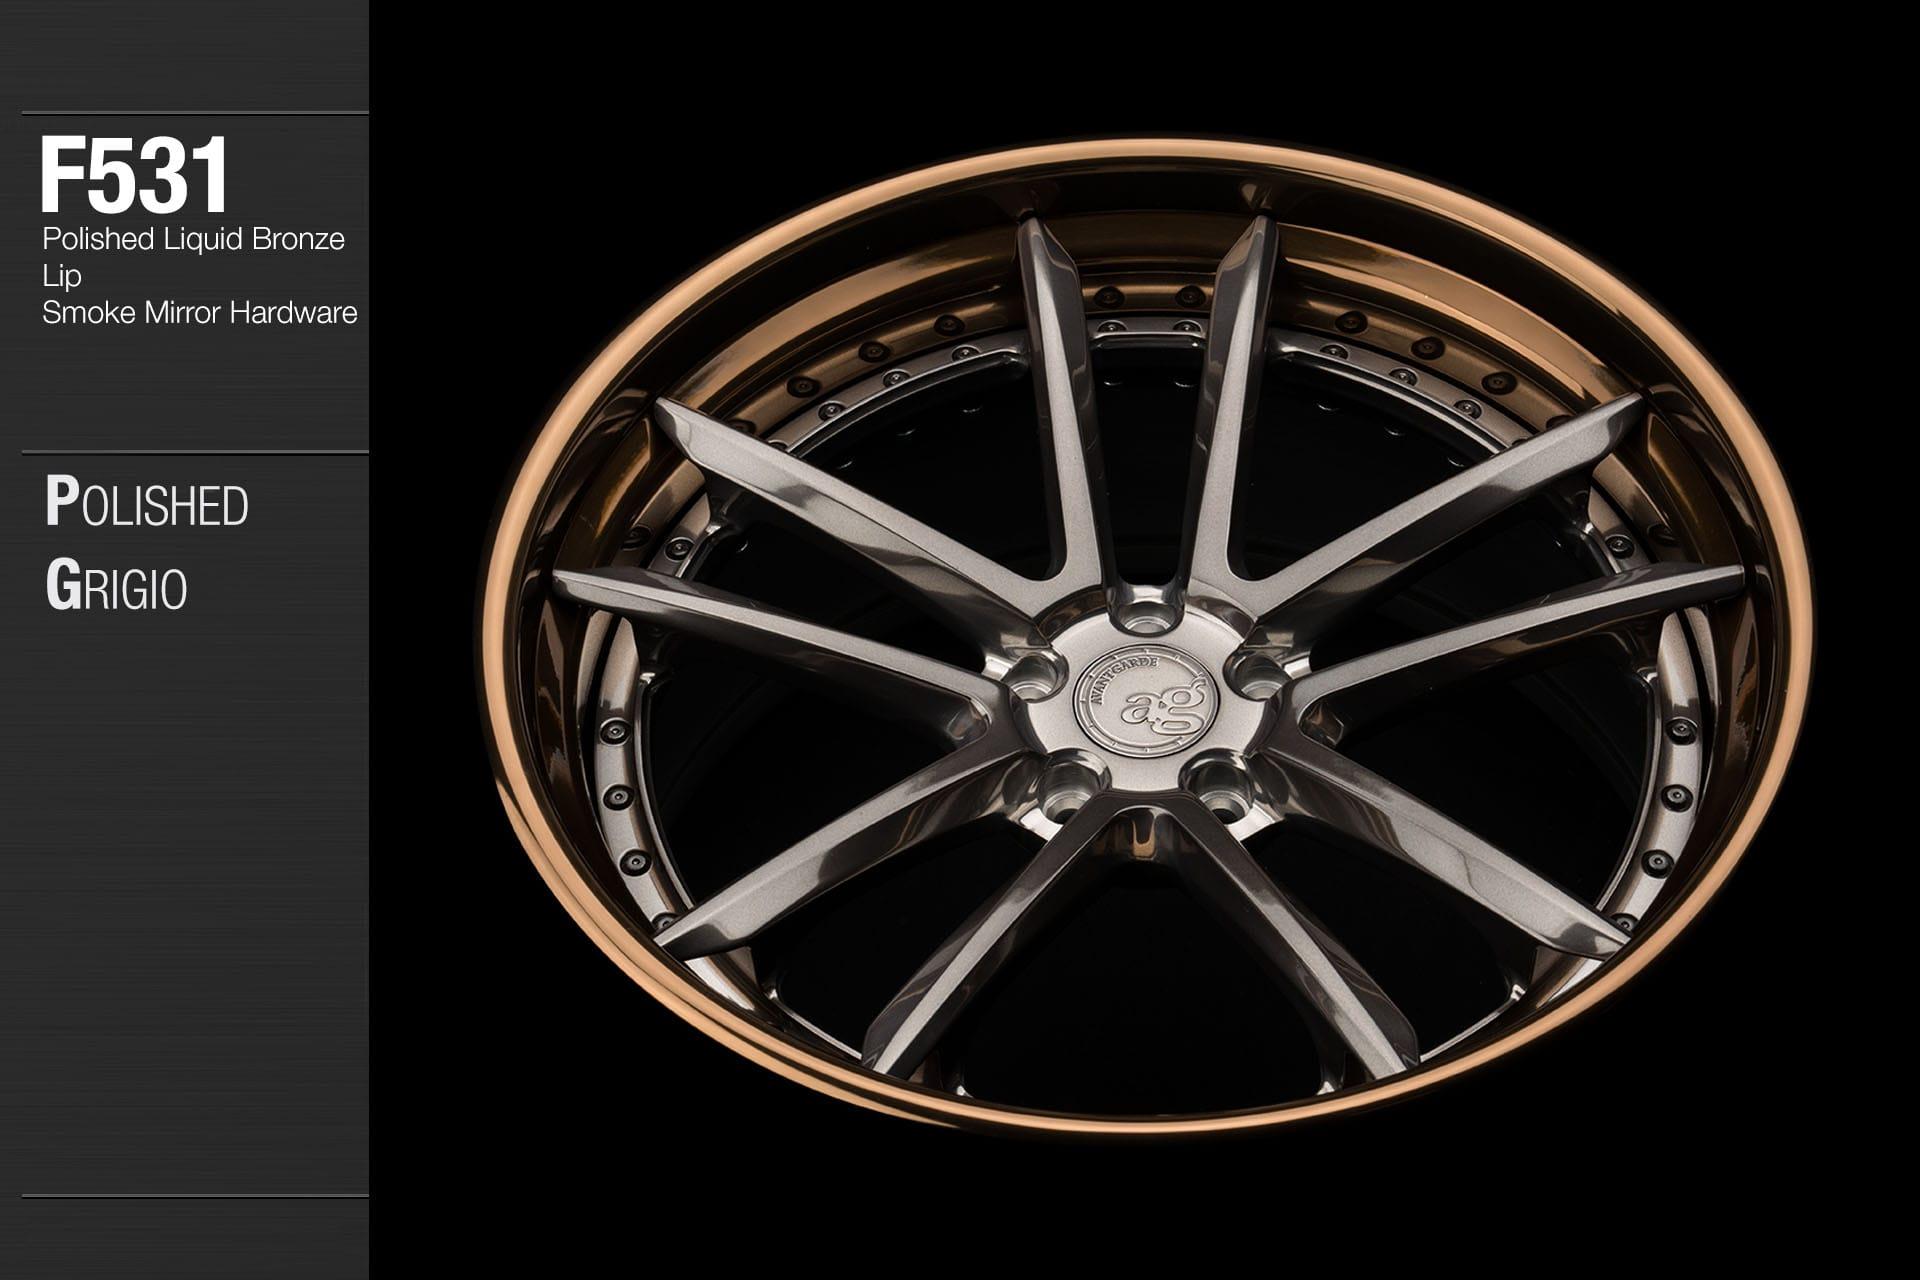 avant-garde-ag-wheels-f531-polished-grigio-face-liquid-bronze-lip-smoke-mirror-hardware-3-min